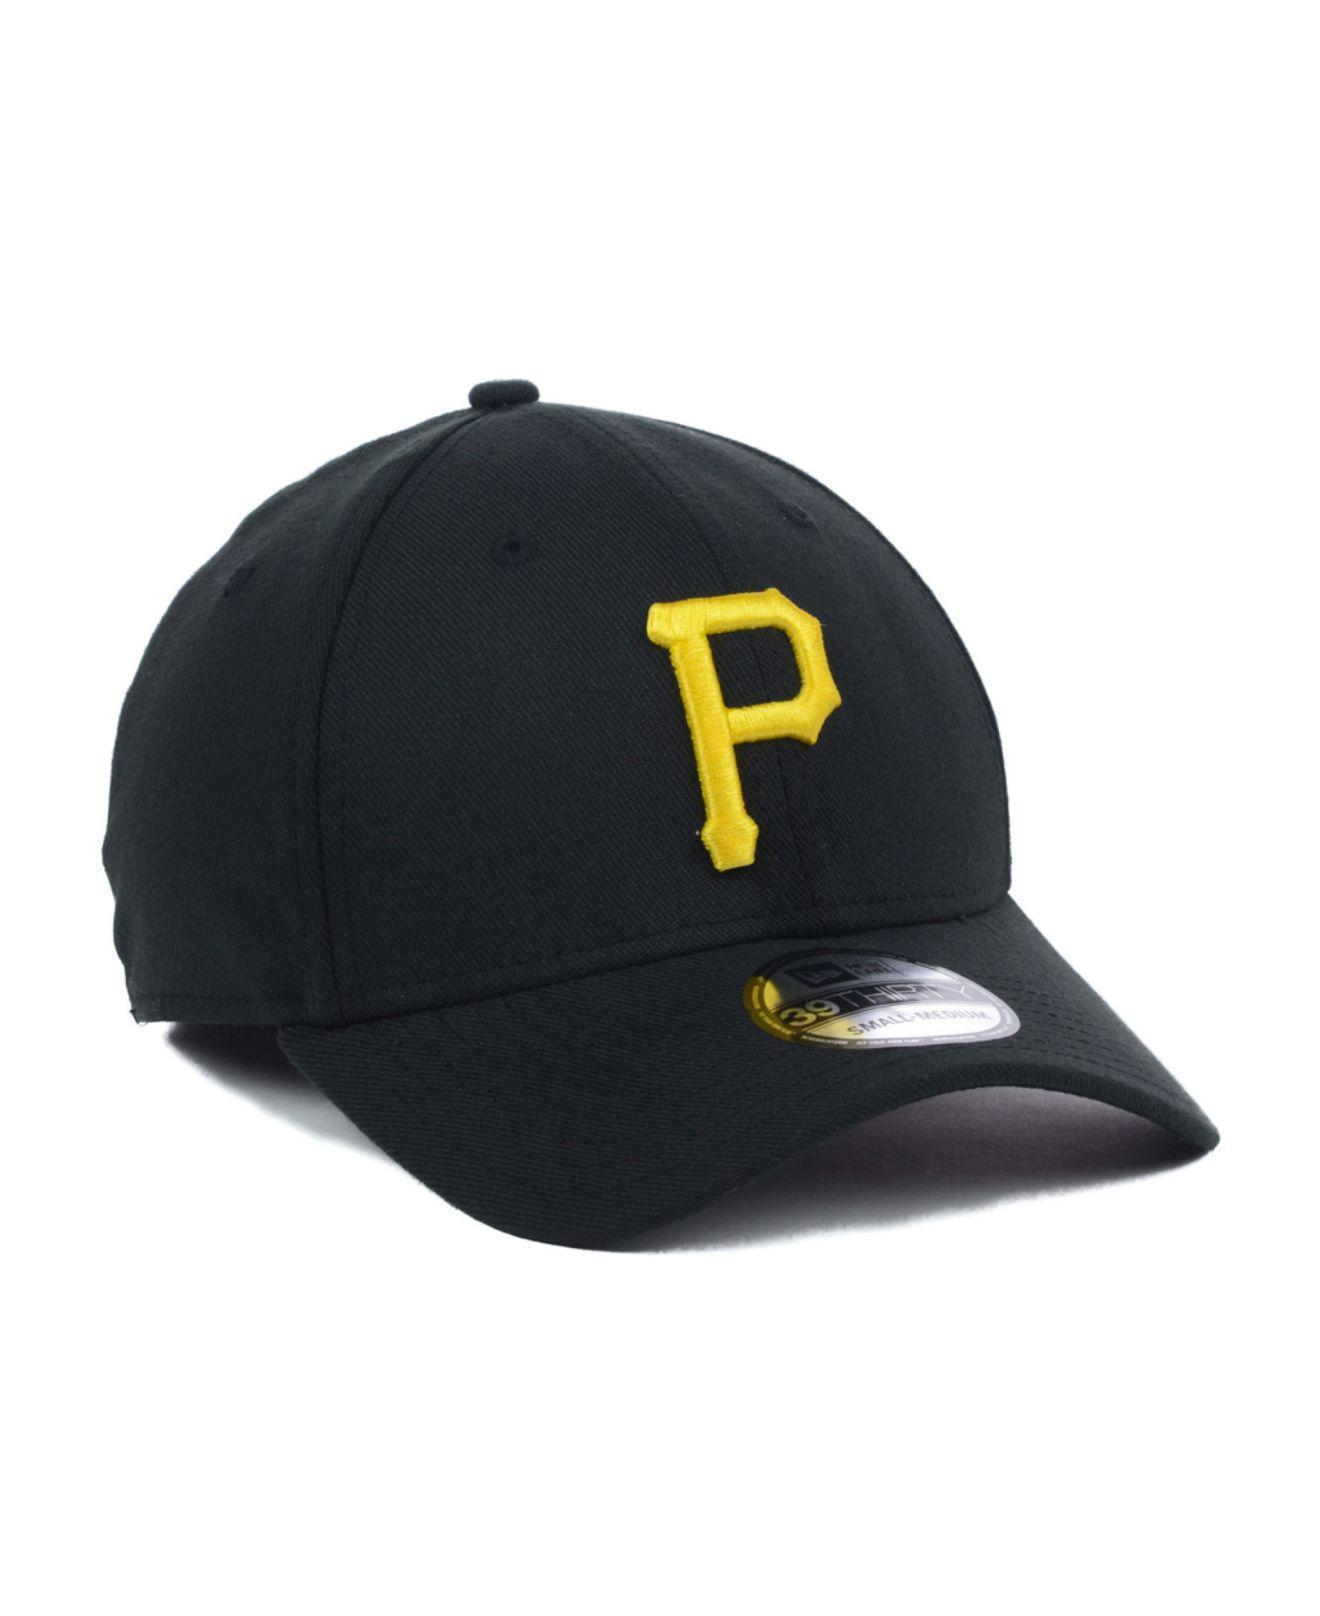 f3a6d9cbdf2 ... Pittsburgh Pirates Mlb Team Classic 39thirty Cap for Men - Lyst. View  fullscreen